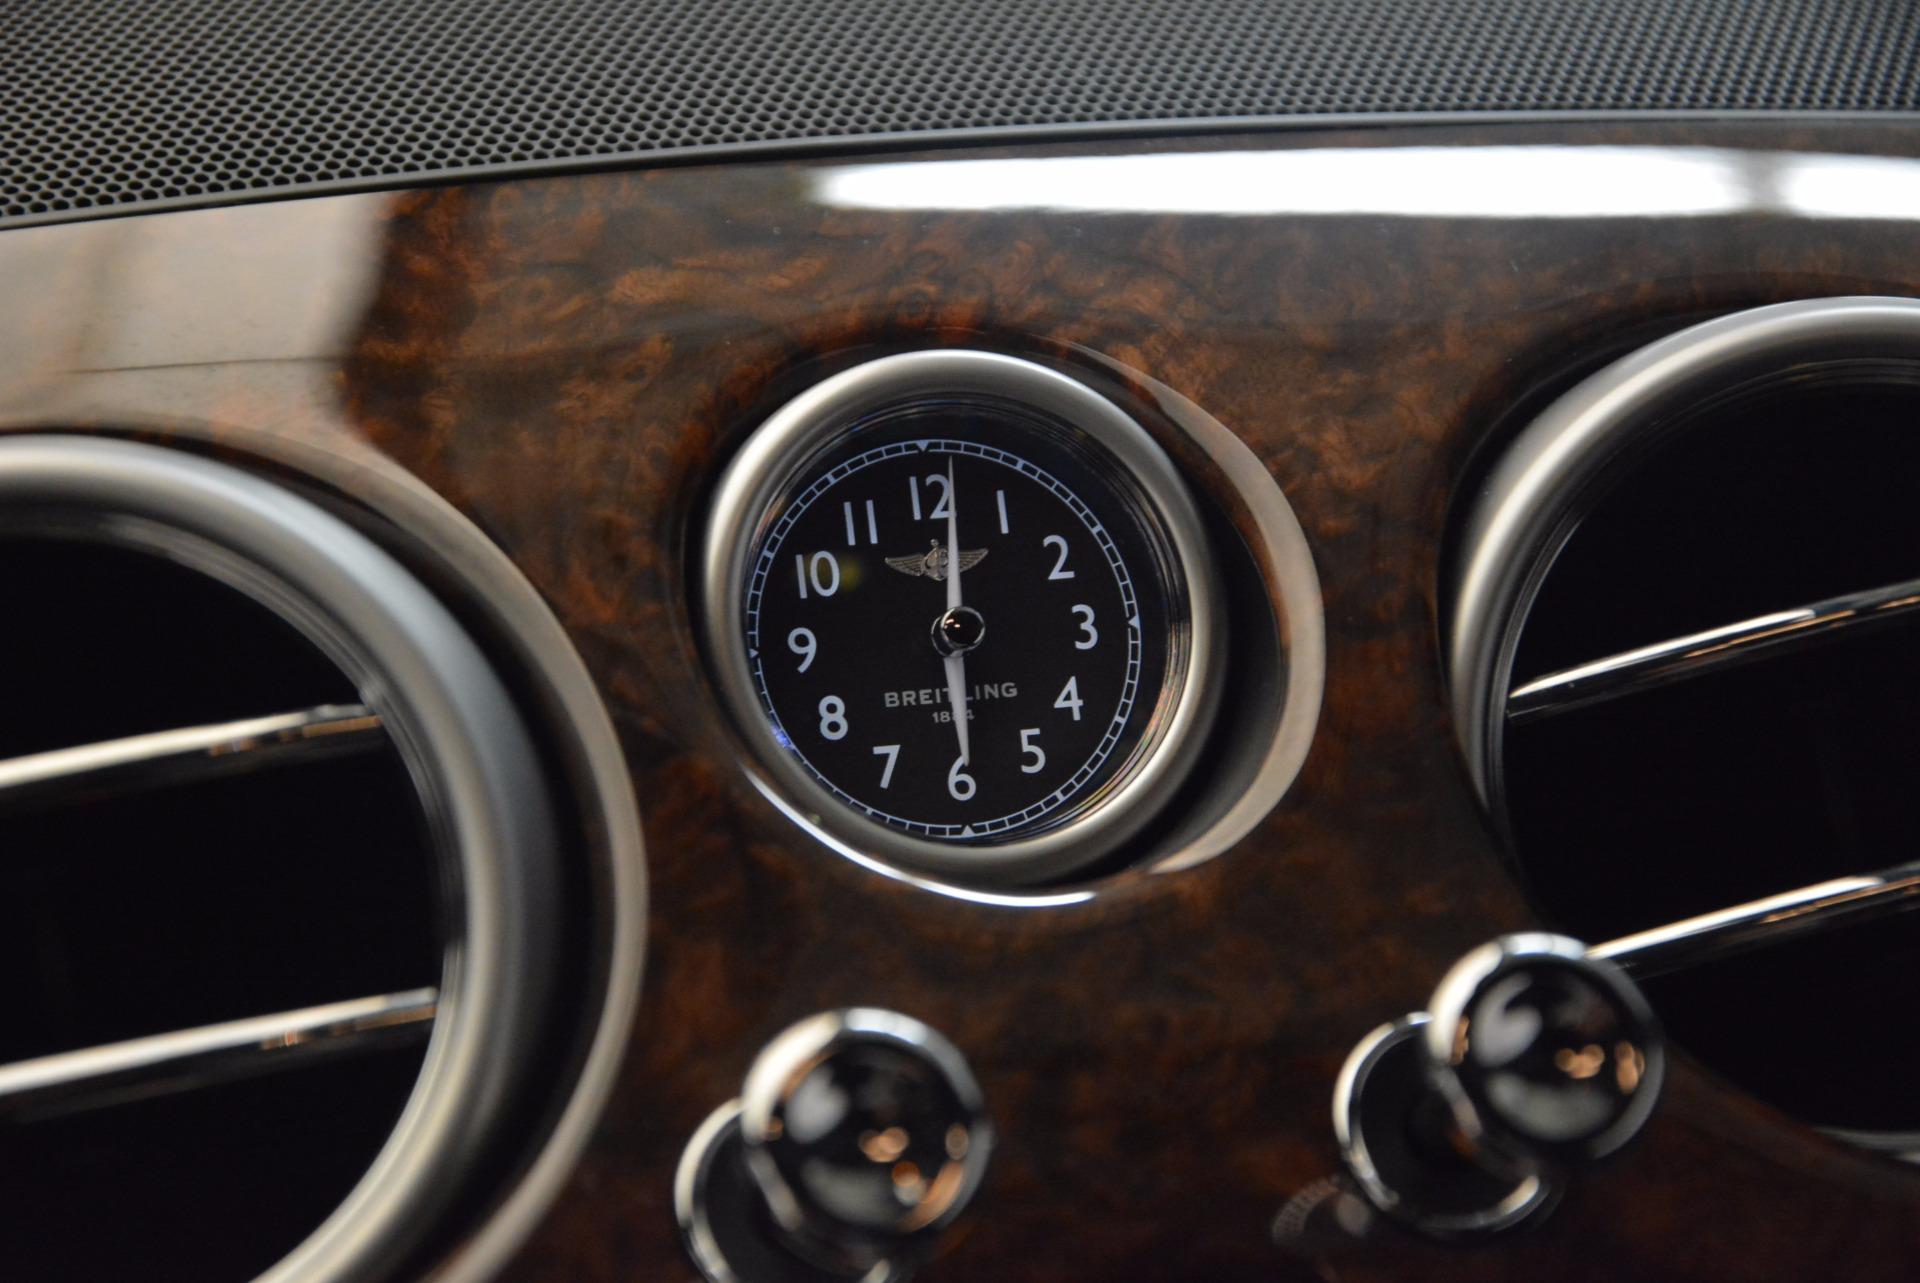 Used 2015 Bentley Continental GT Speed For Sale In Westport, CT 1646_p28